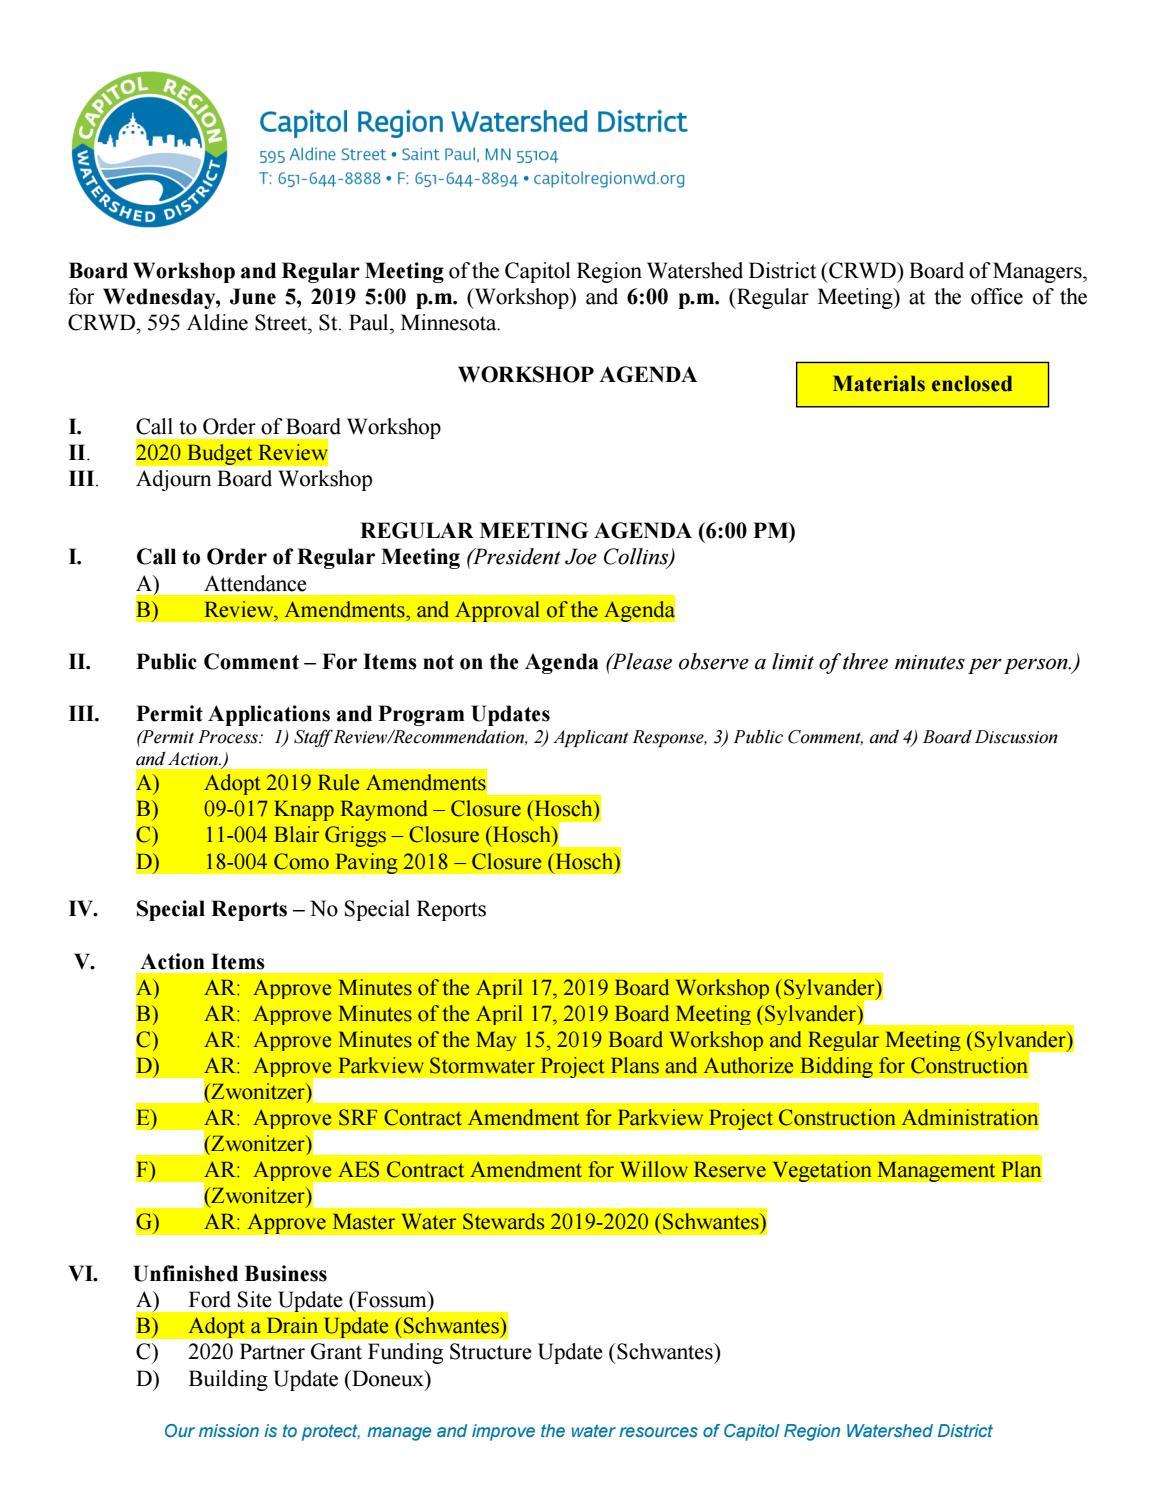 June 5 Board Meeting Packet by Capitol Region Watershed